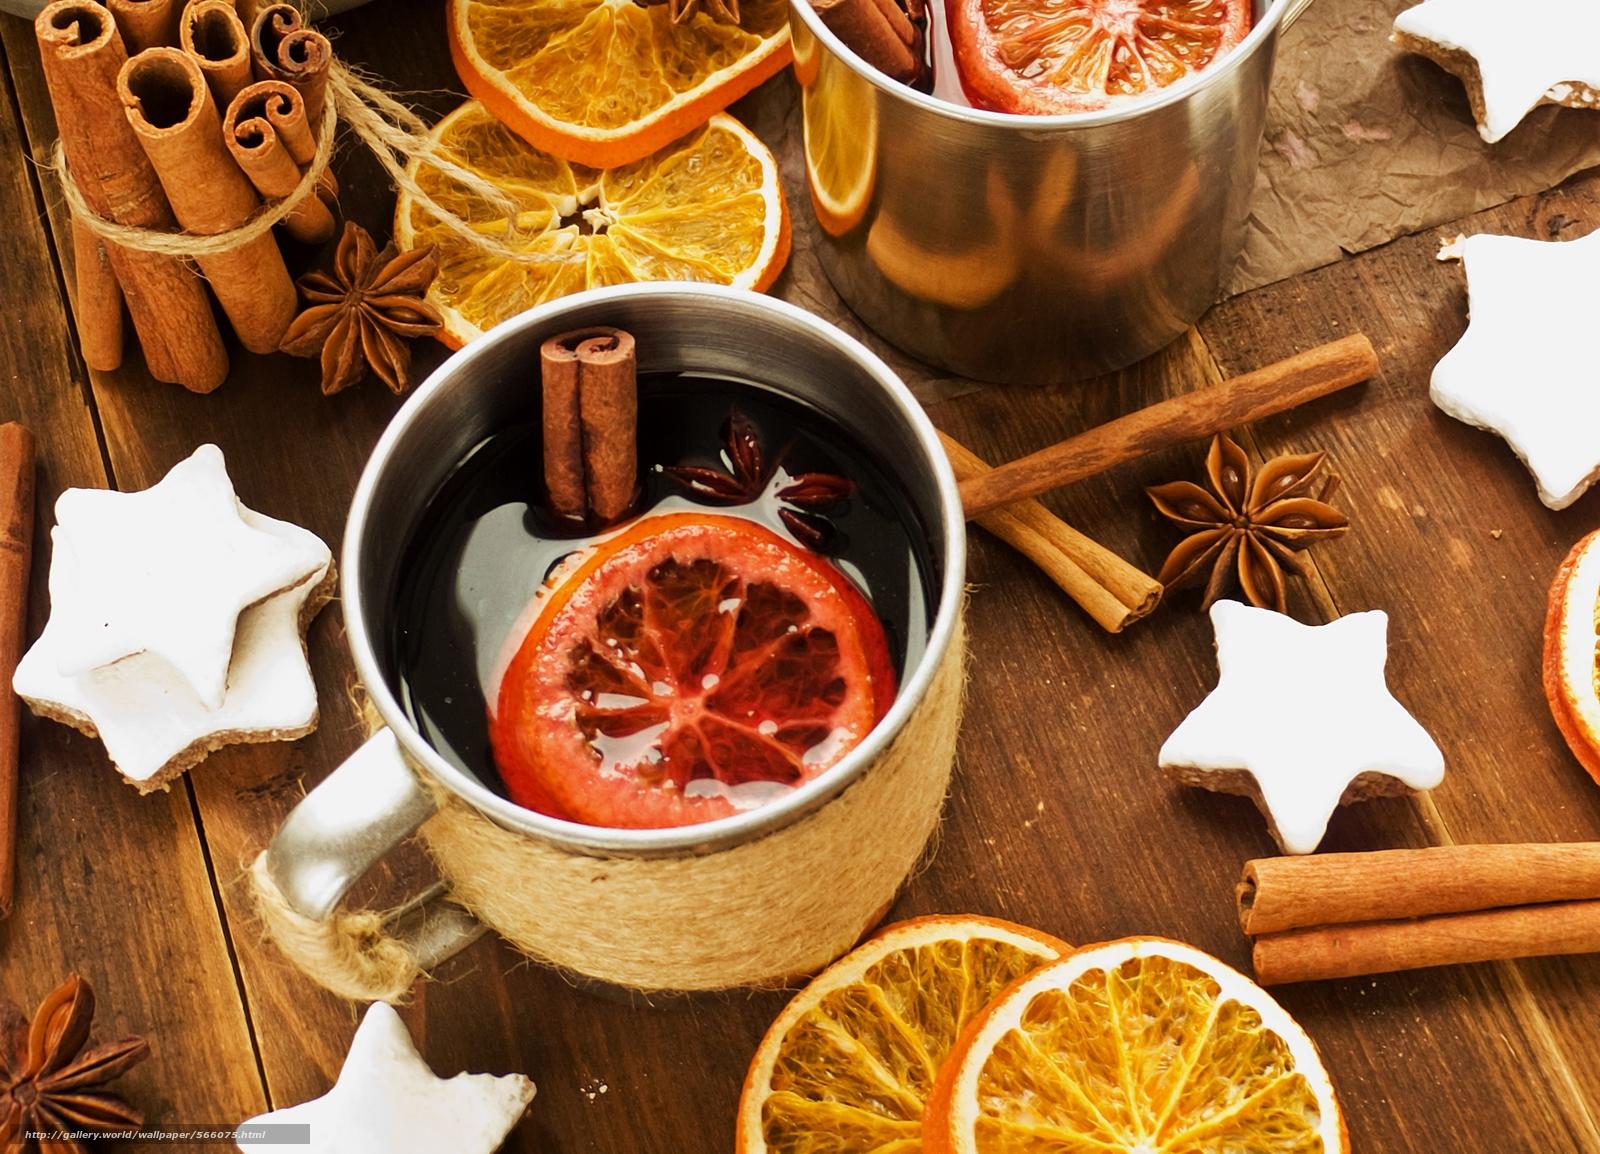 Download wallpaper oranges,  пряности,  New Year,  cup free desktop wallpaper in the resolution 4608x3324 — picture №566075